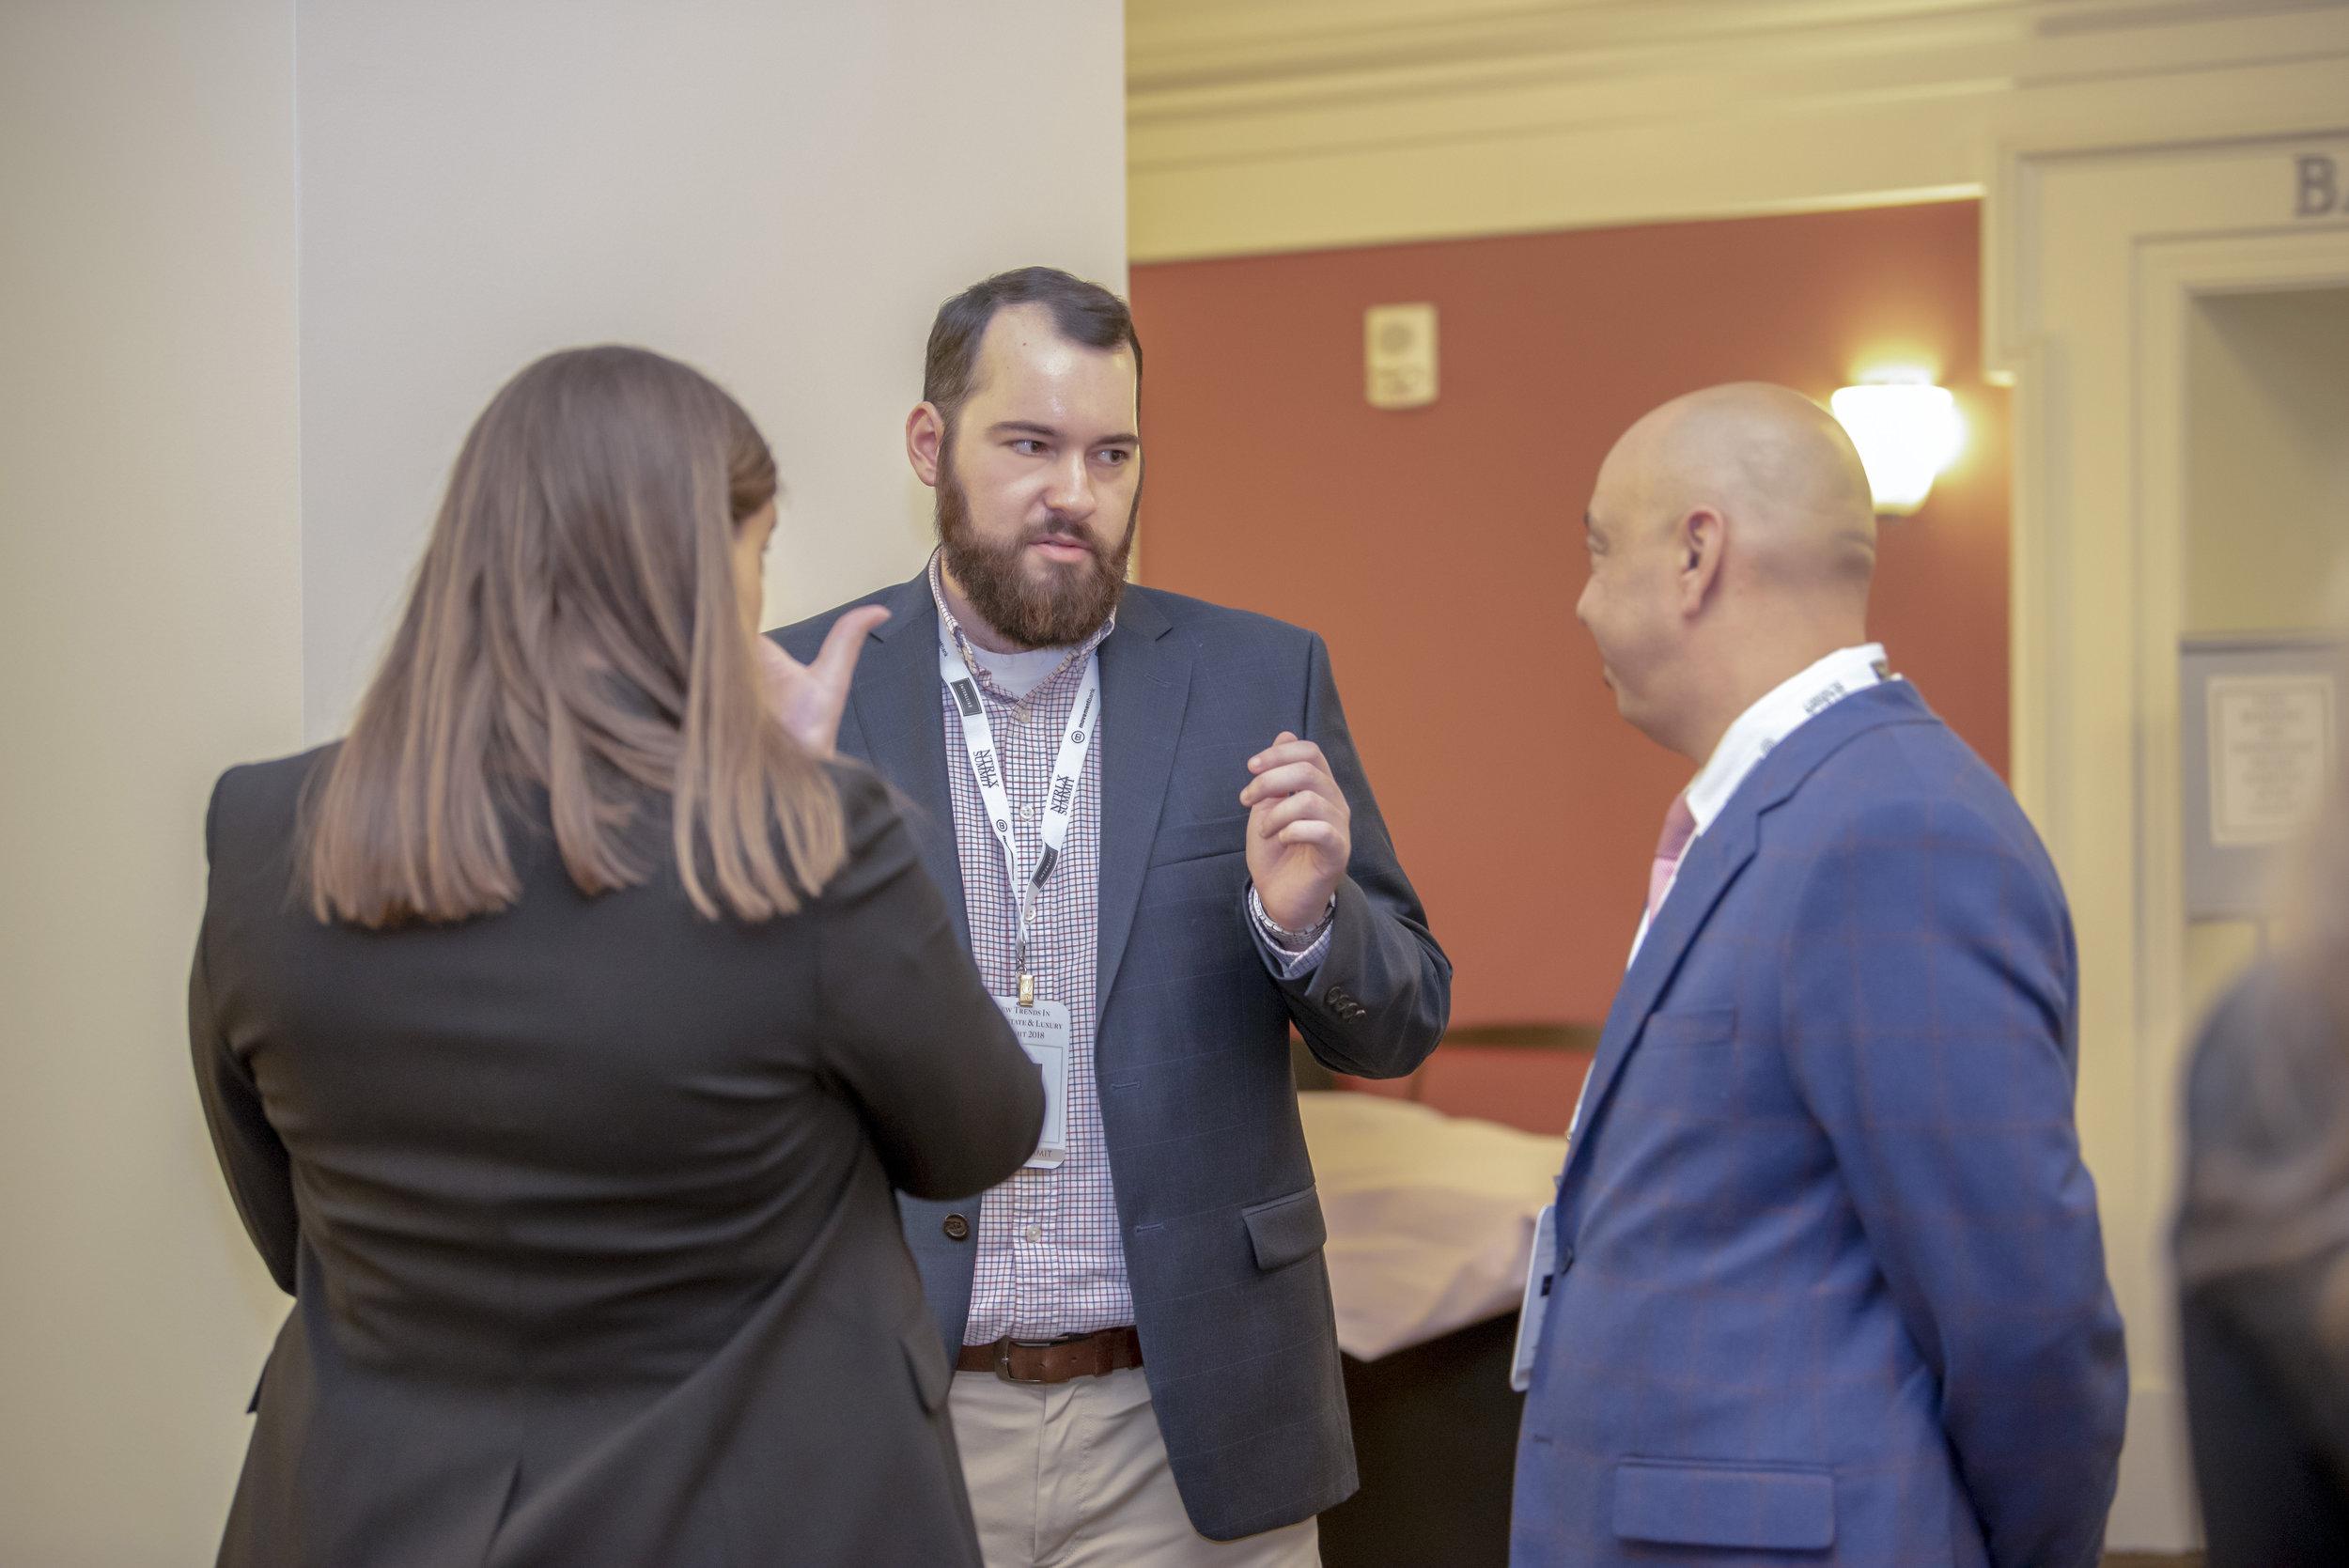 Alex Goodman, Sal Rando, and Ashley O'Leary of Interluxe